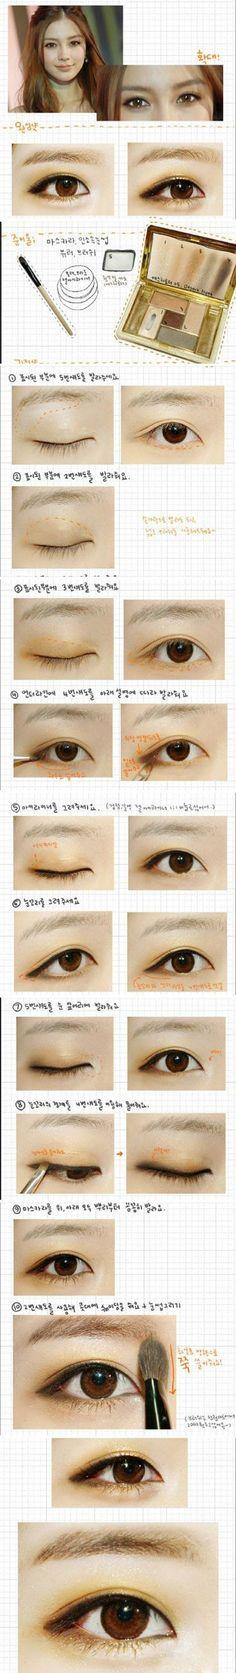 Korean Natural Eyebrow Tutorial by Liah Yoo - Korean Makeup Asian Makeup Looks, Korean Eye Makeup, Makeup Tips, Beauty Makeup, Hair Makeup, Eyebrow Makeup, Makeup Products, Monolid Makeup, Asian Make Up